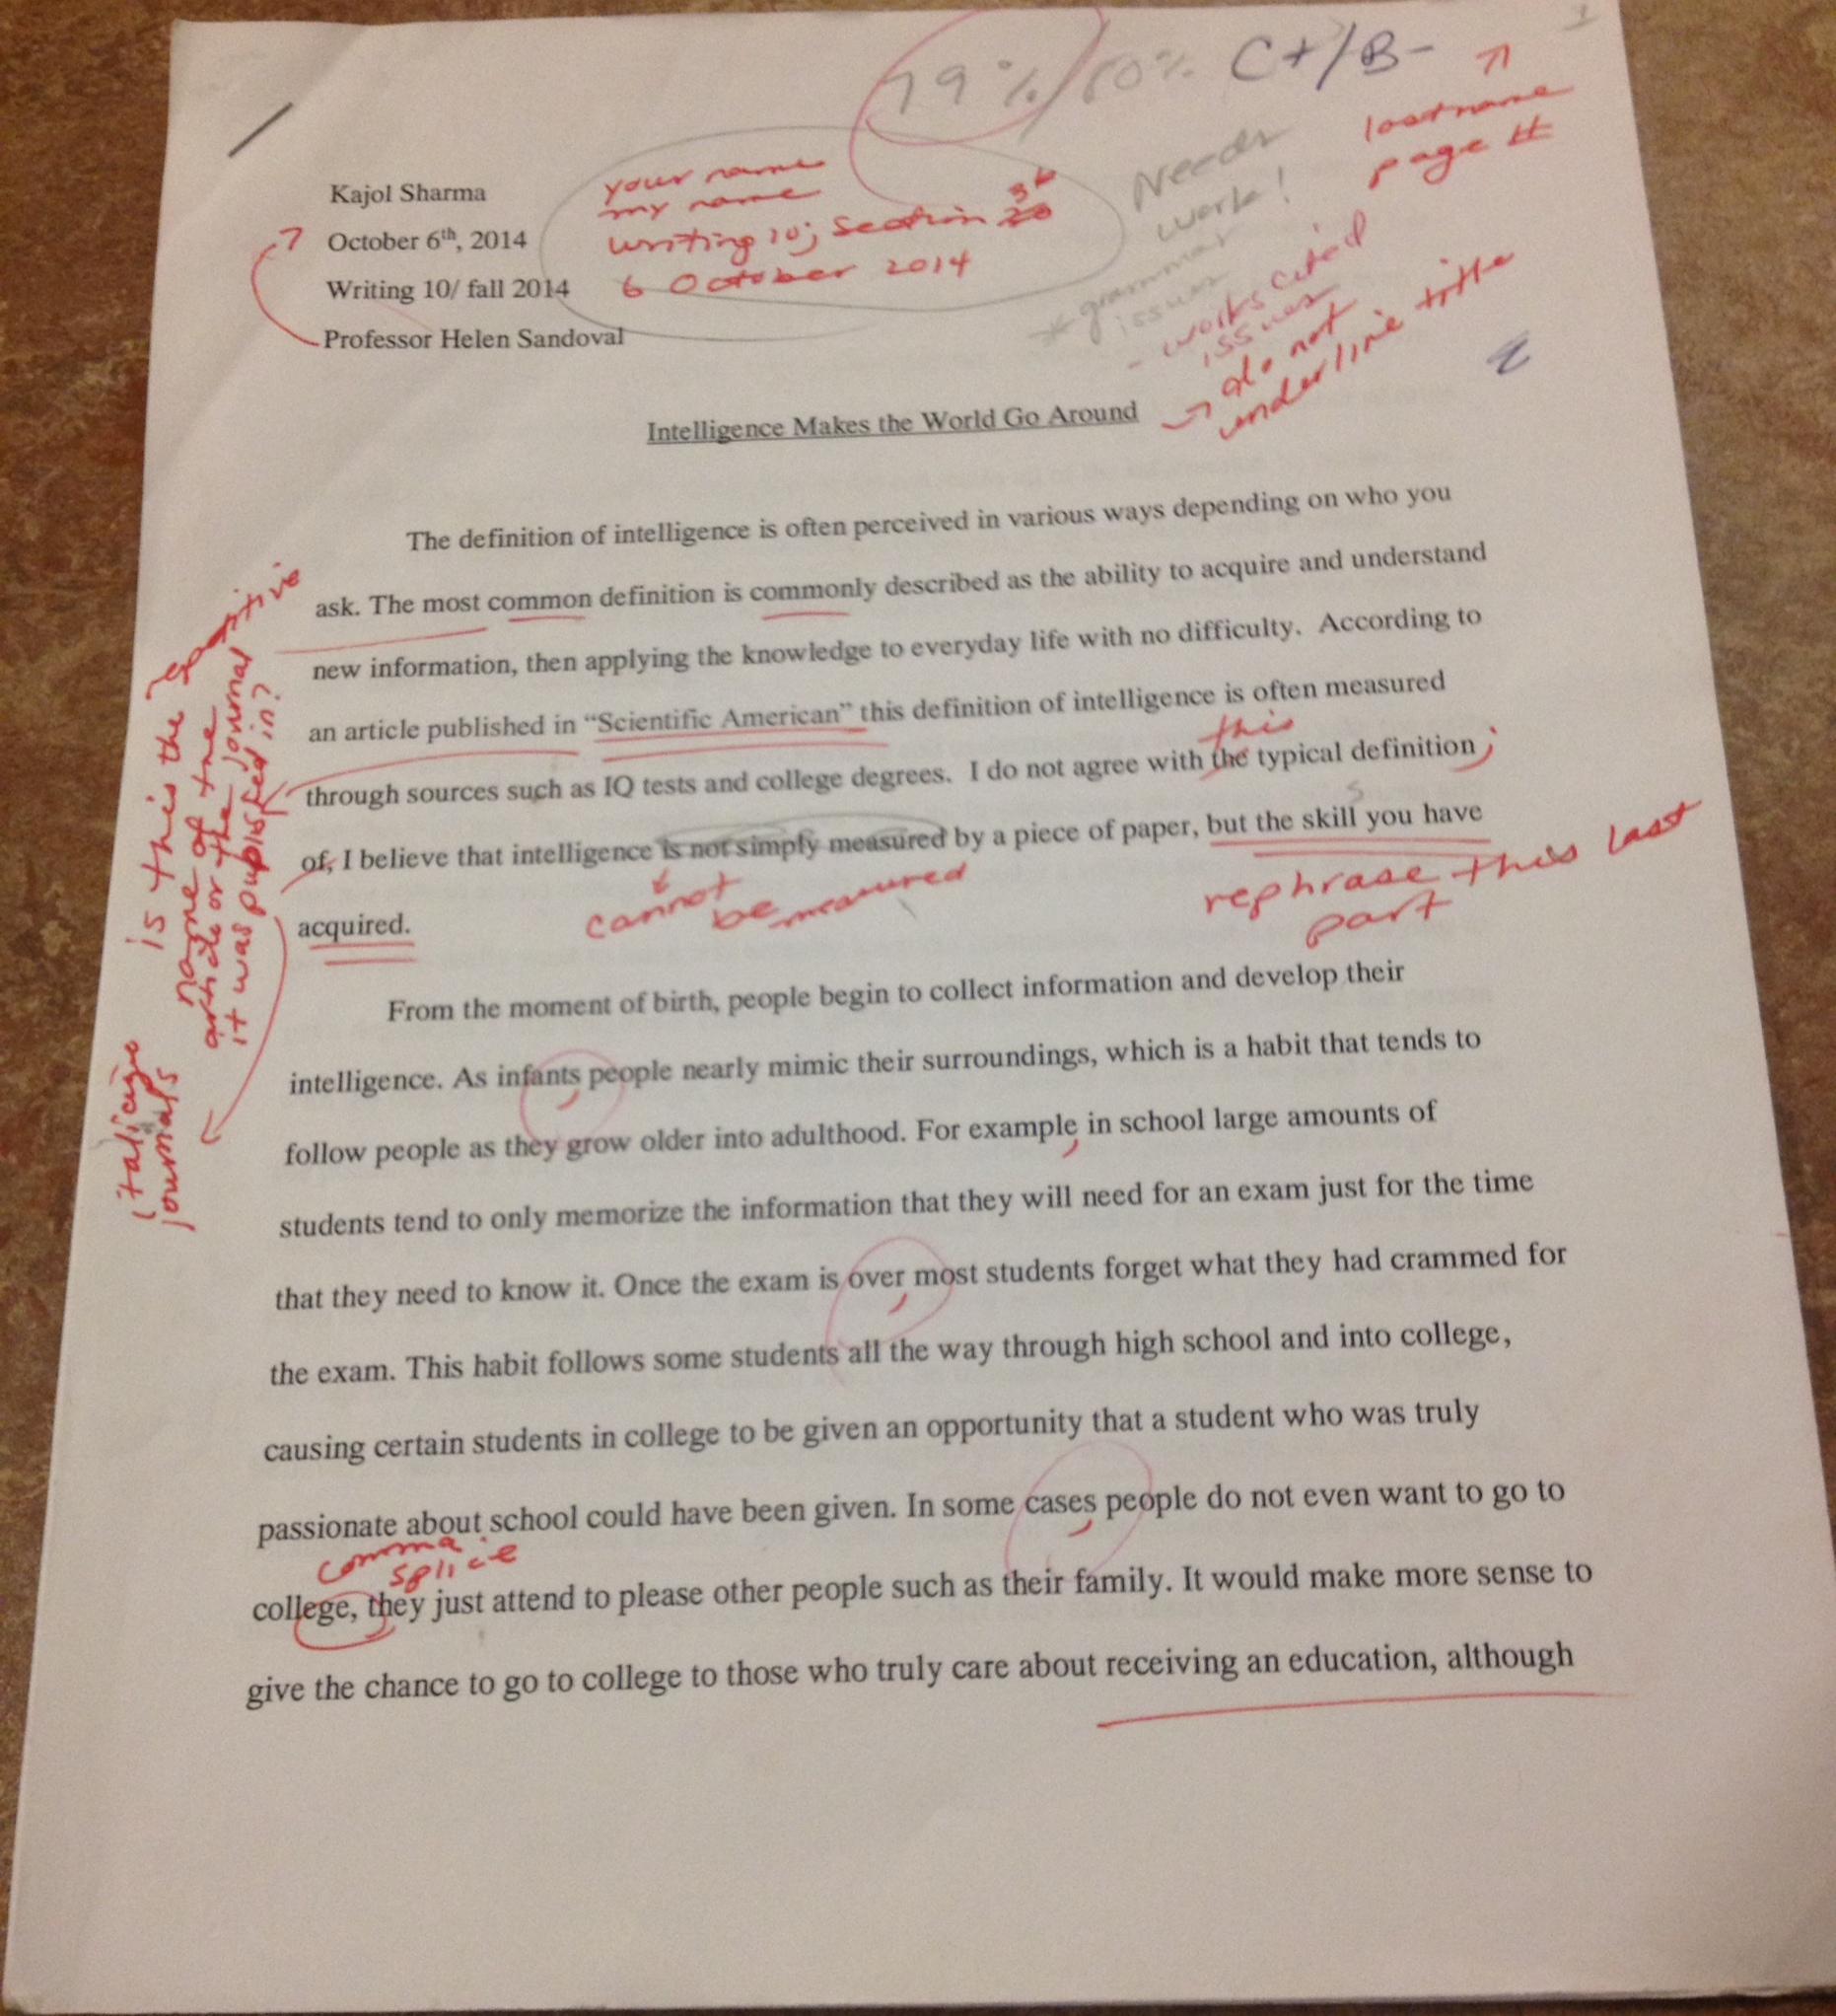 001 Process Ksharma8 Essay Professor Writing Amazing Teaching College On My In French Full